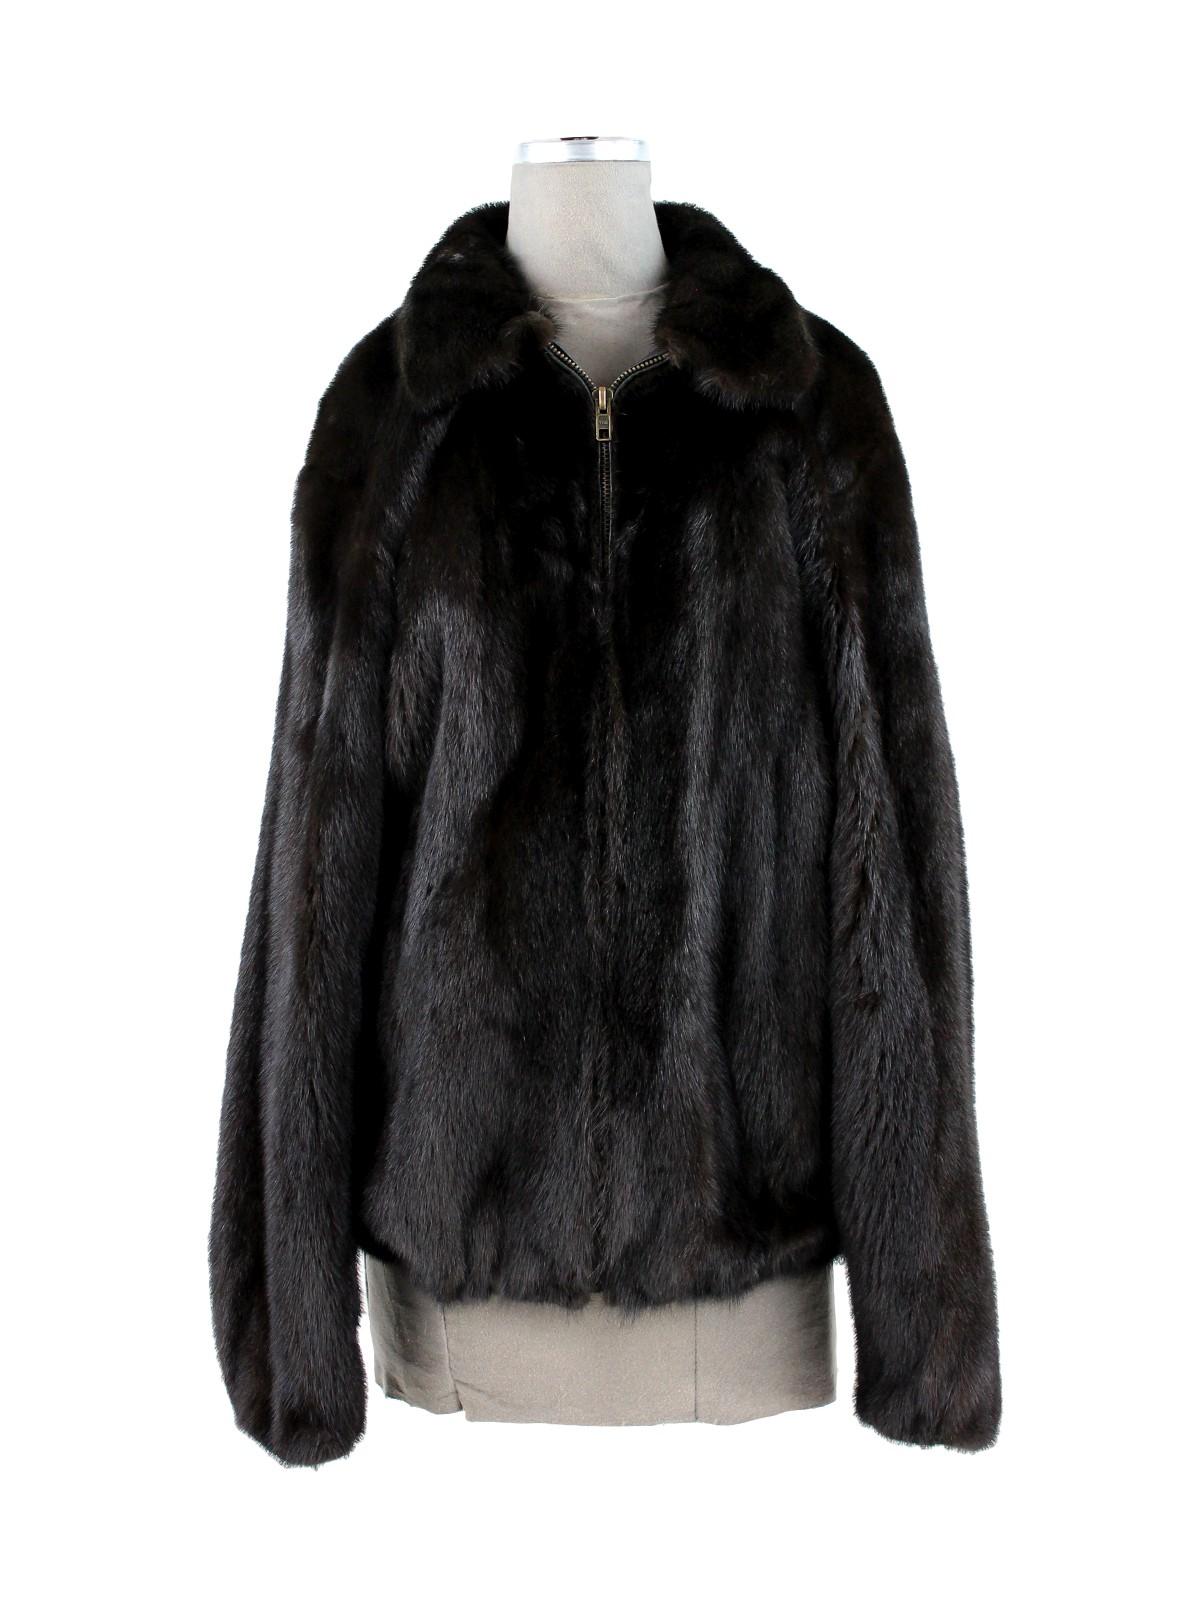 Man's Ranch Mink Fur Jacket